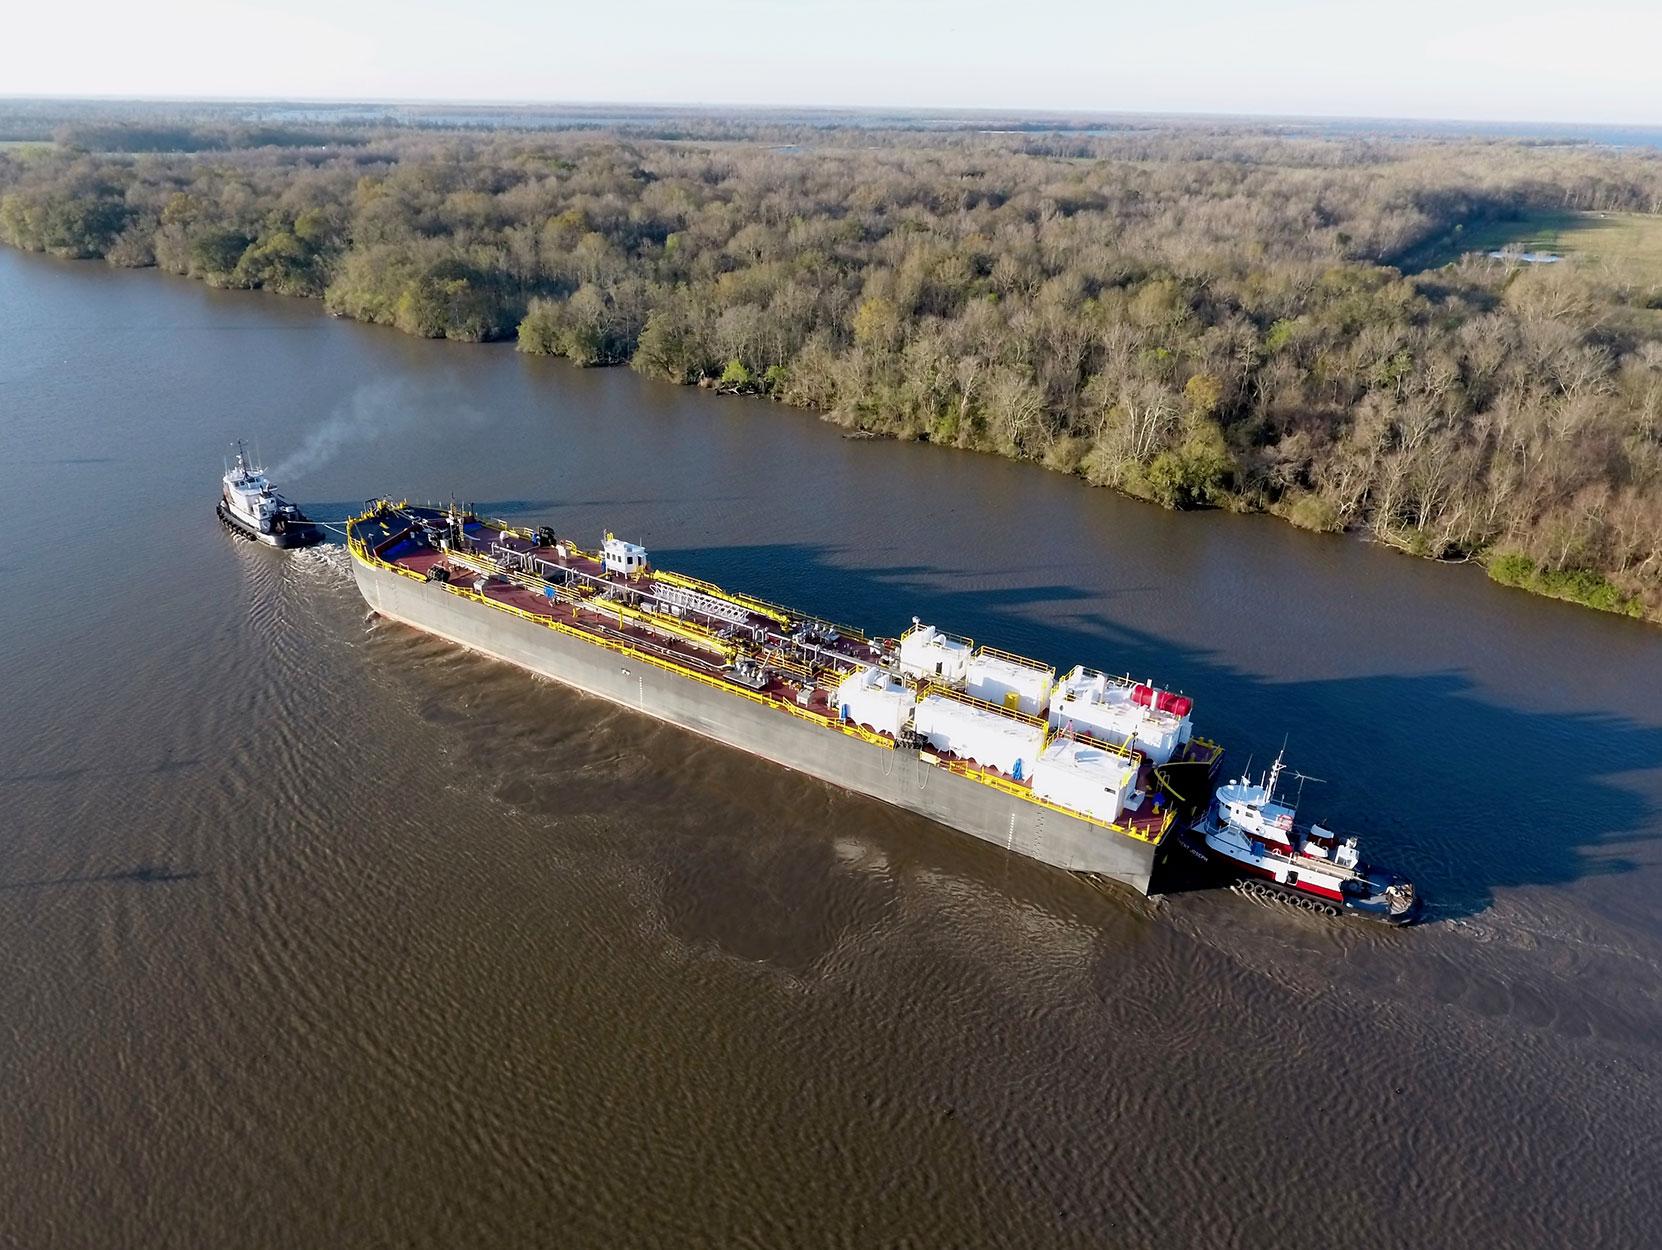 Double hull oil barge for asphalt transport